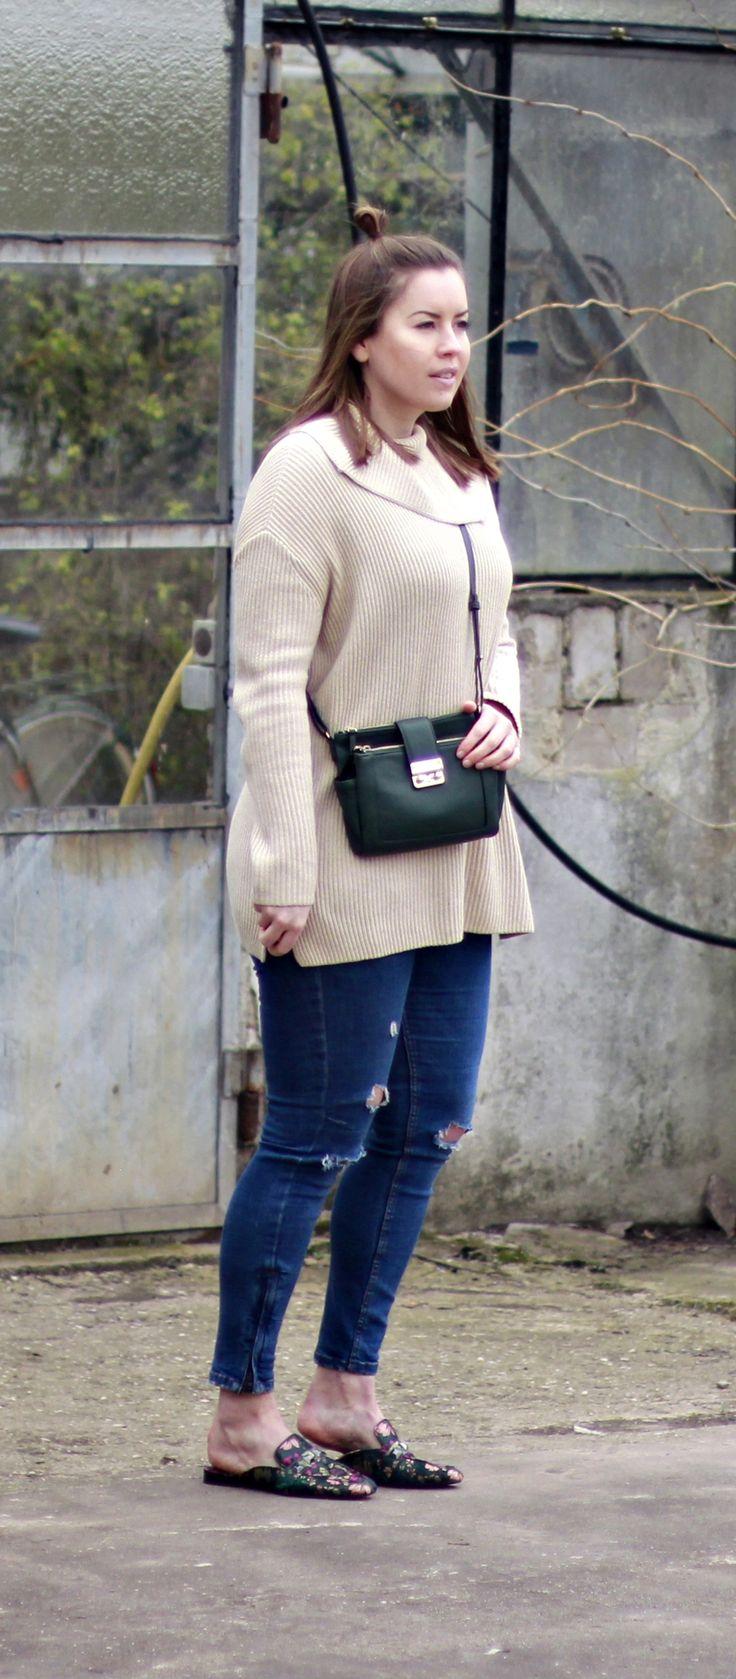 embroided Slipper, Slipper Trend, Slipper, COS Sweater, Cross Body Bag, ripped Jeans, Half-Bun